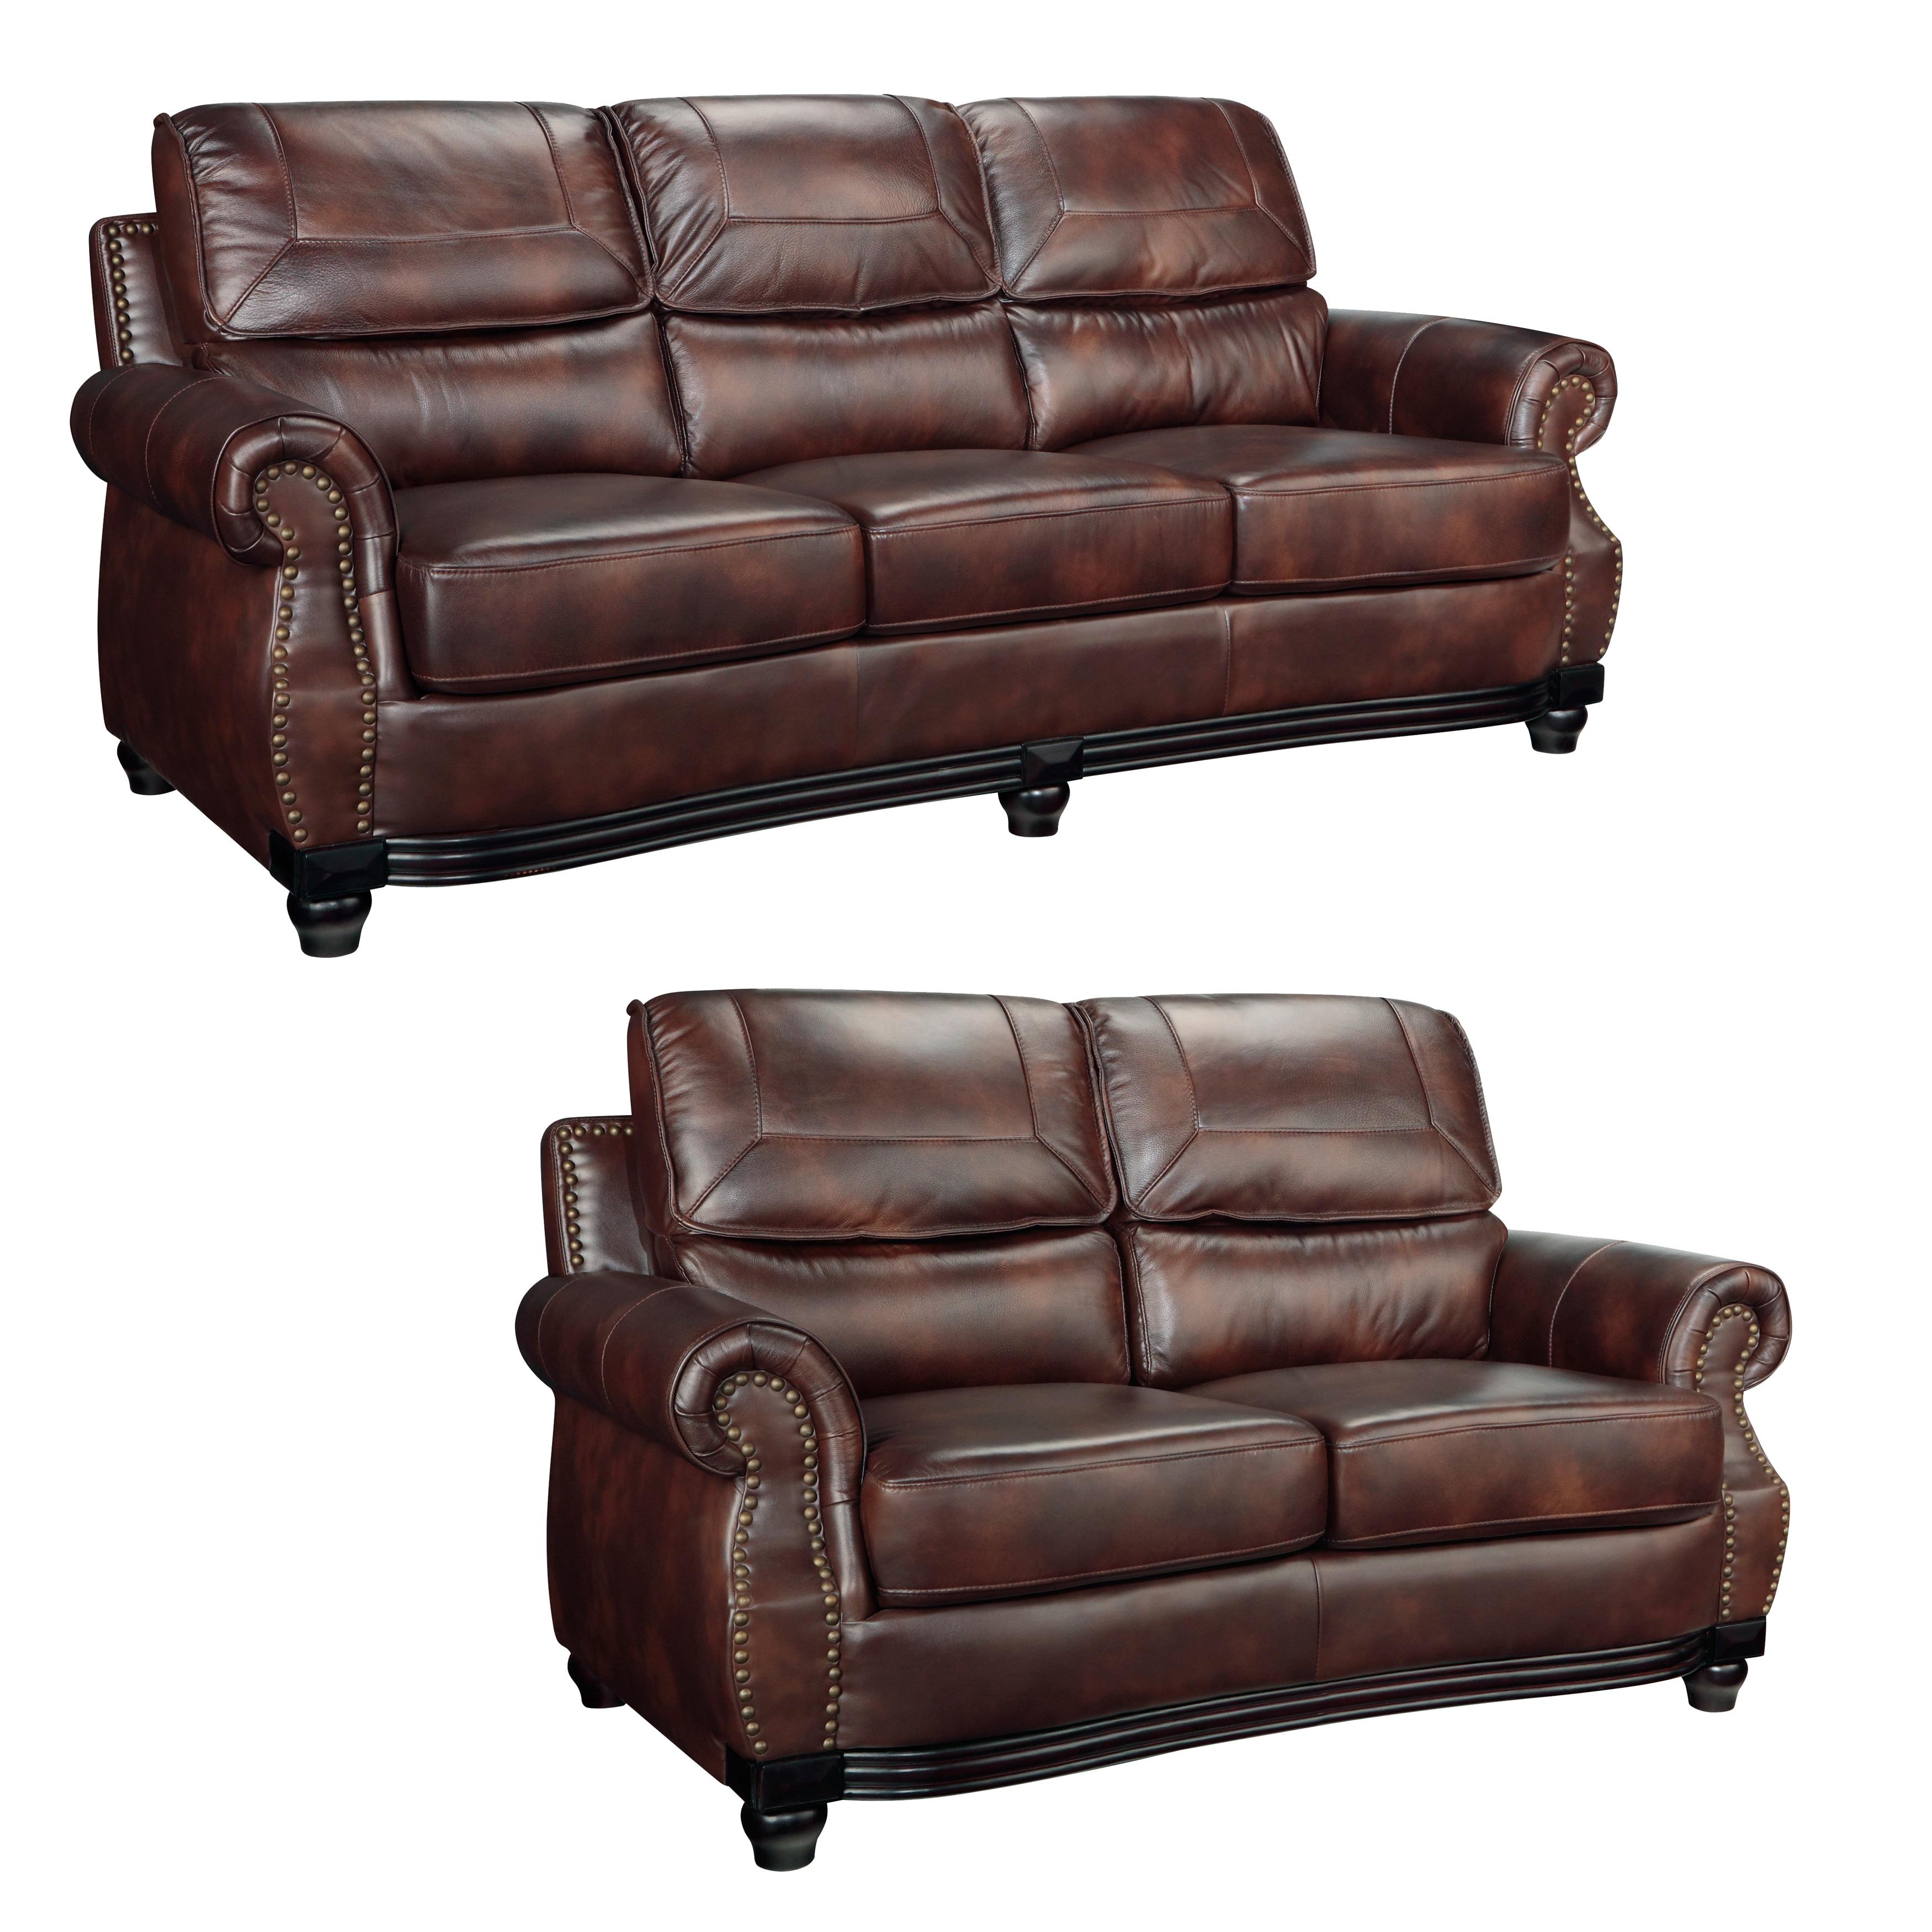 Overstock.com Maverick Cocoa Brown Italian Leather Sofa and Loveseat at Sears.com